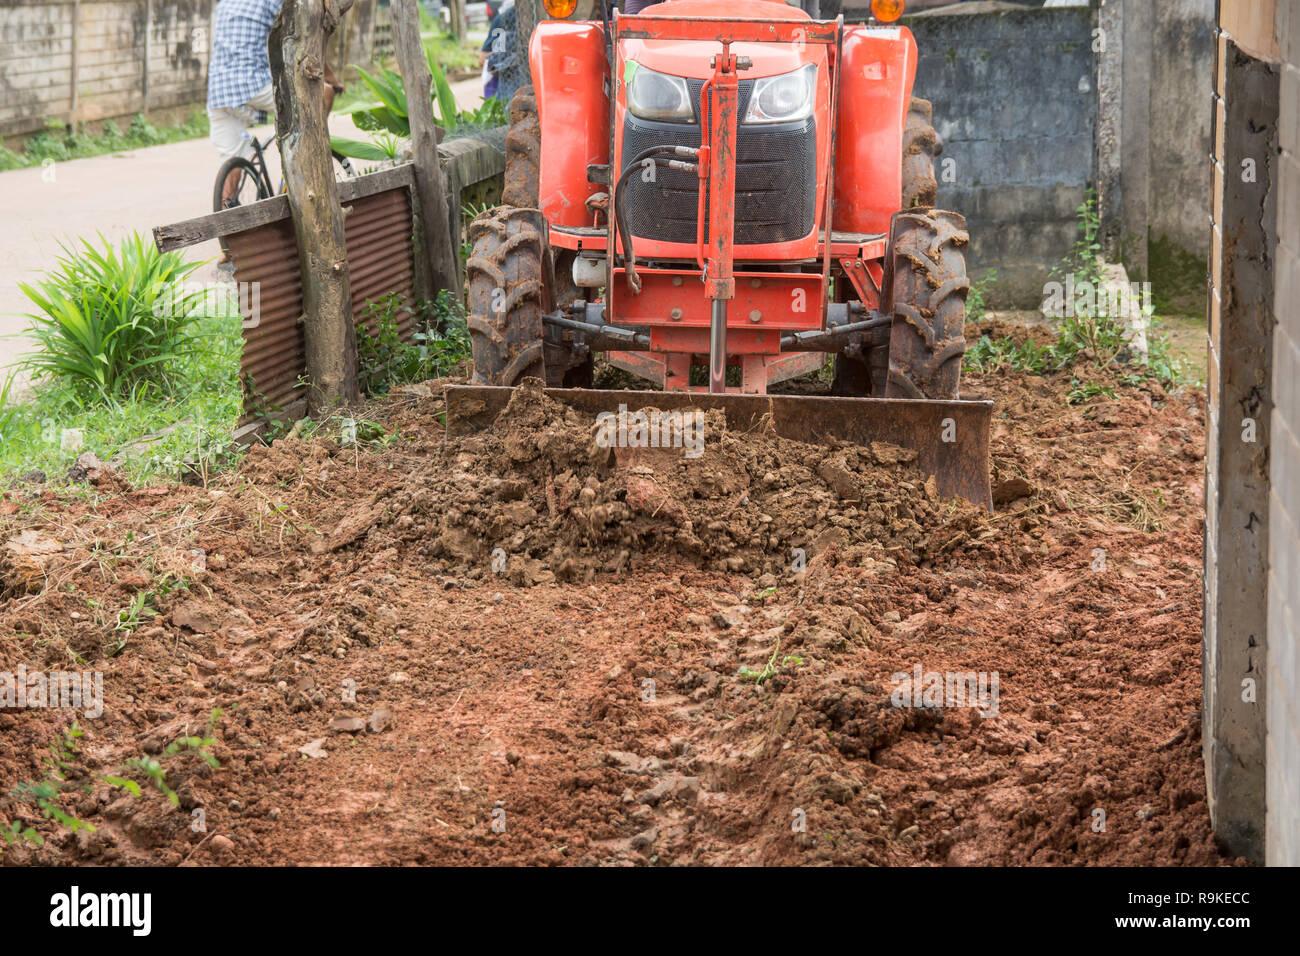 Leveling Soil Stock Photos & Leveling Soil Stock Images - Alamy